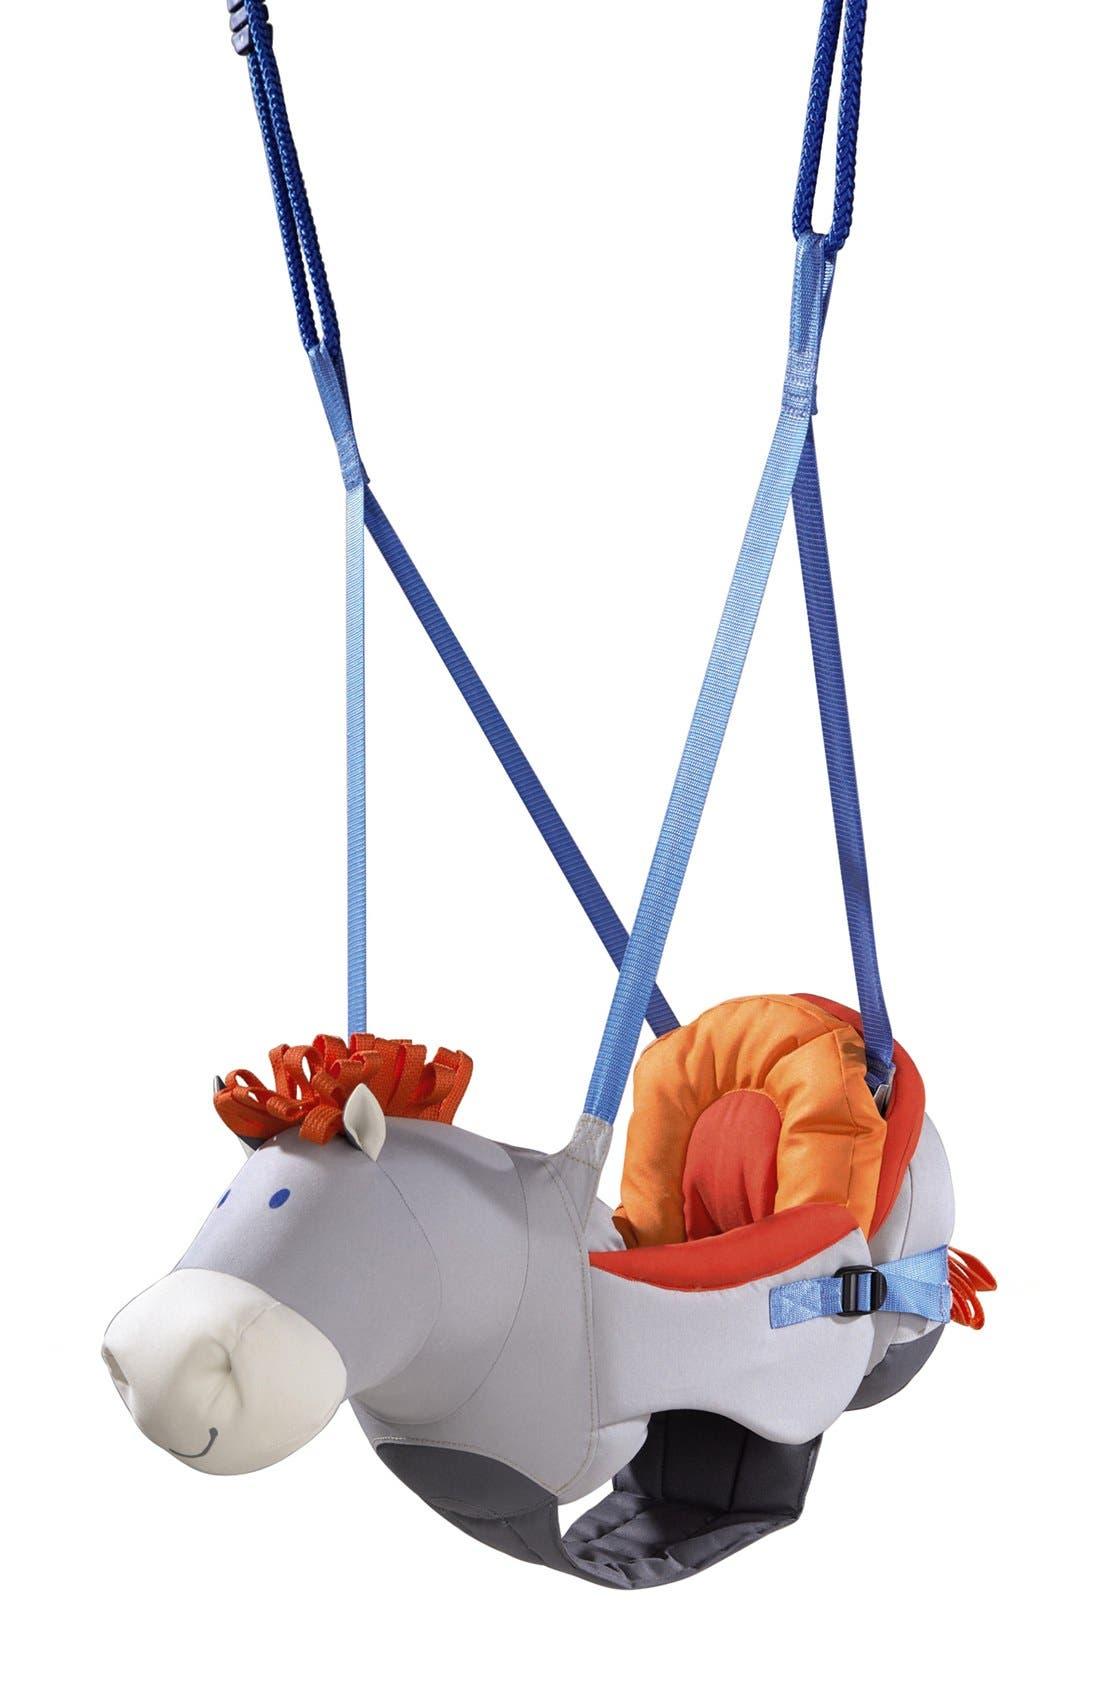 Main Image - HABA Horse Baby Swing